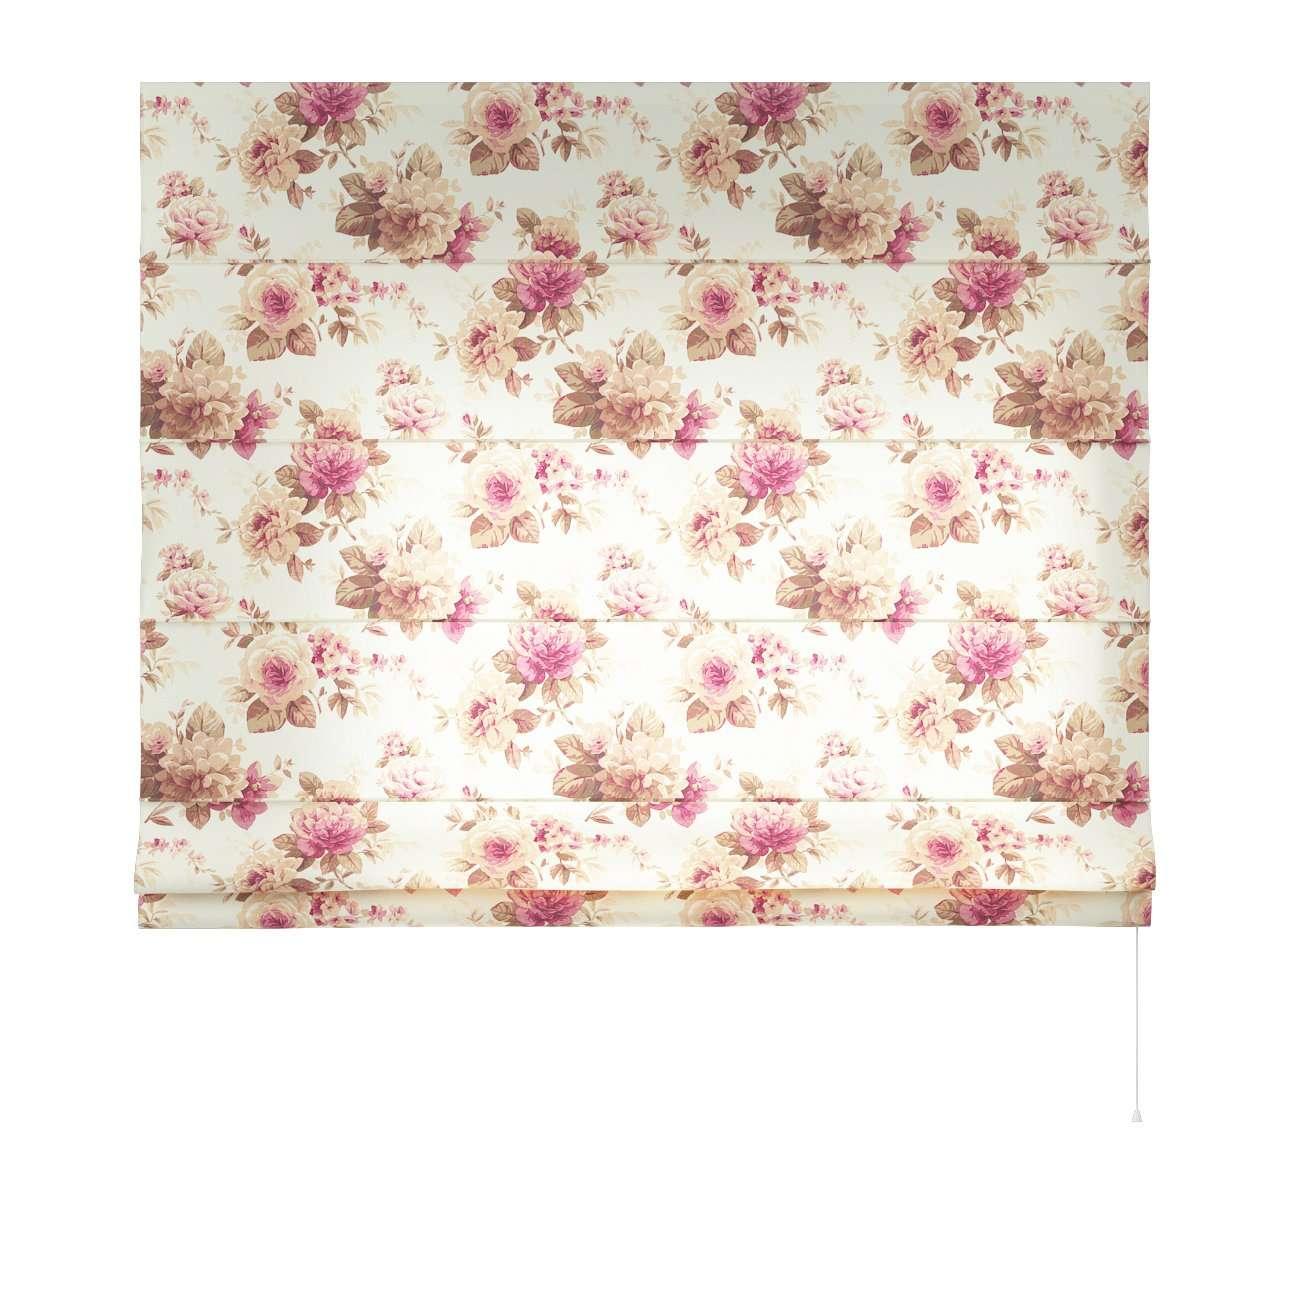 Romanetės Capri 80 x 170 cm (plotis x ilgis) kolekcijoje Mirella, audinys: 141-06